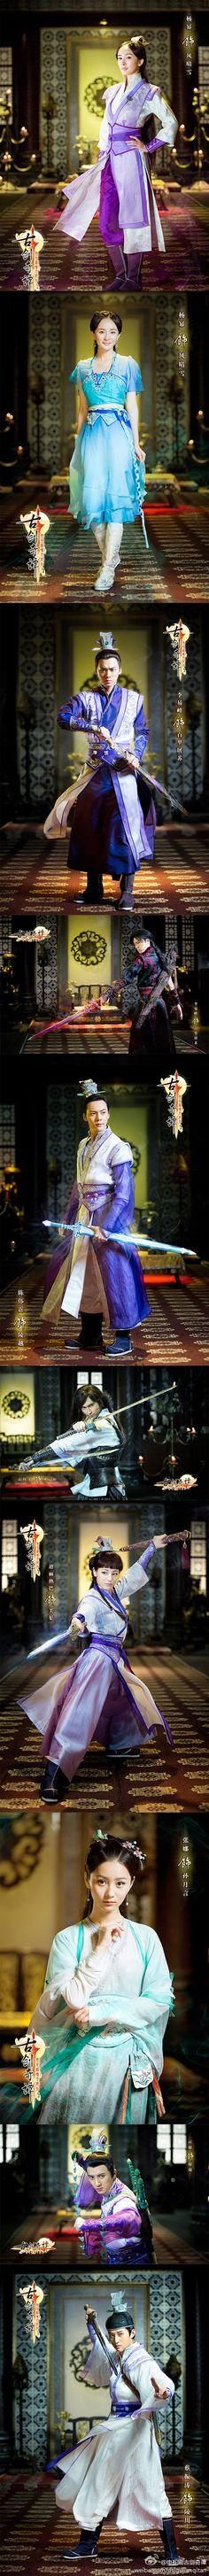 Ancient Sword Fantasy 《古剑奇谭》 - Li Yi Feng, Yang Mi, William Chan, Ma Tianyu